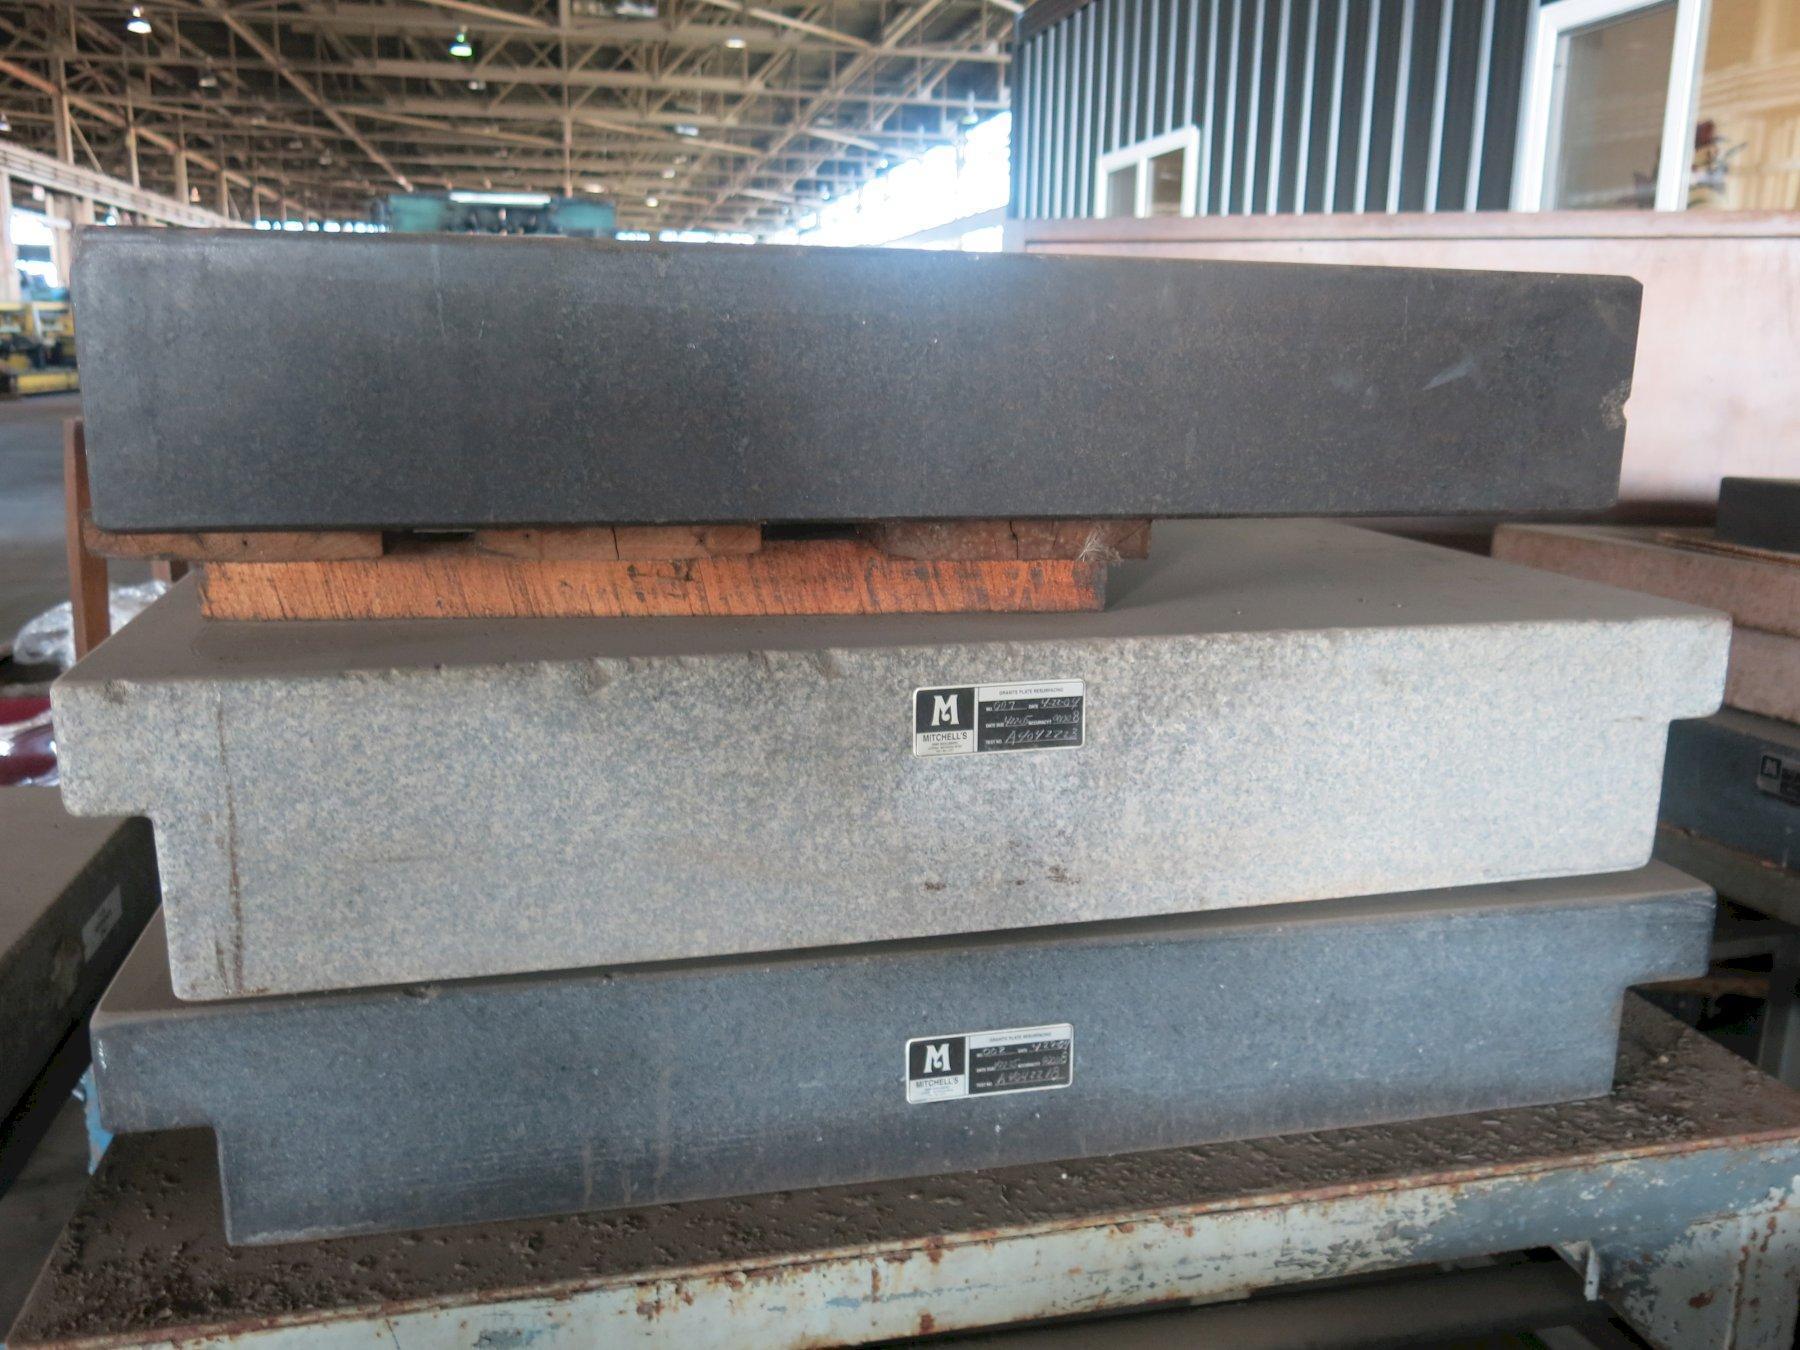 "Mitchell's 24"" x 36"" x 4.5"" Grey Granite Surface Plate"